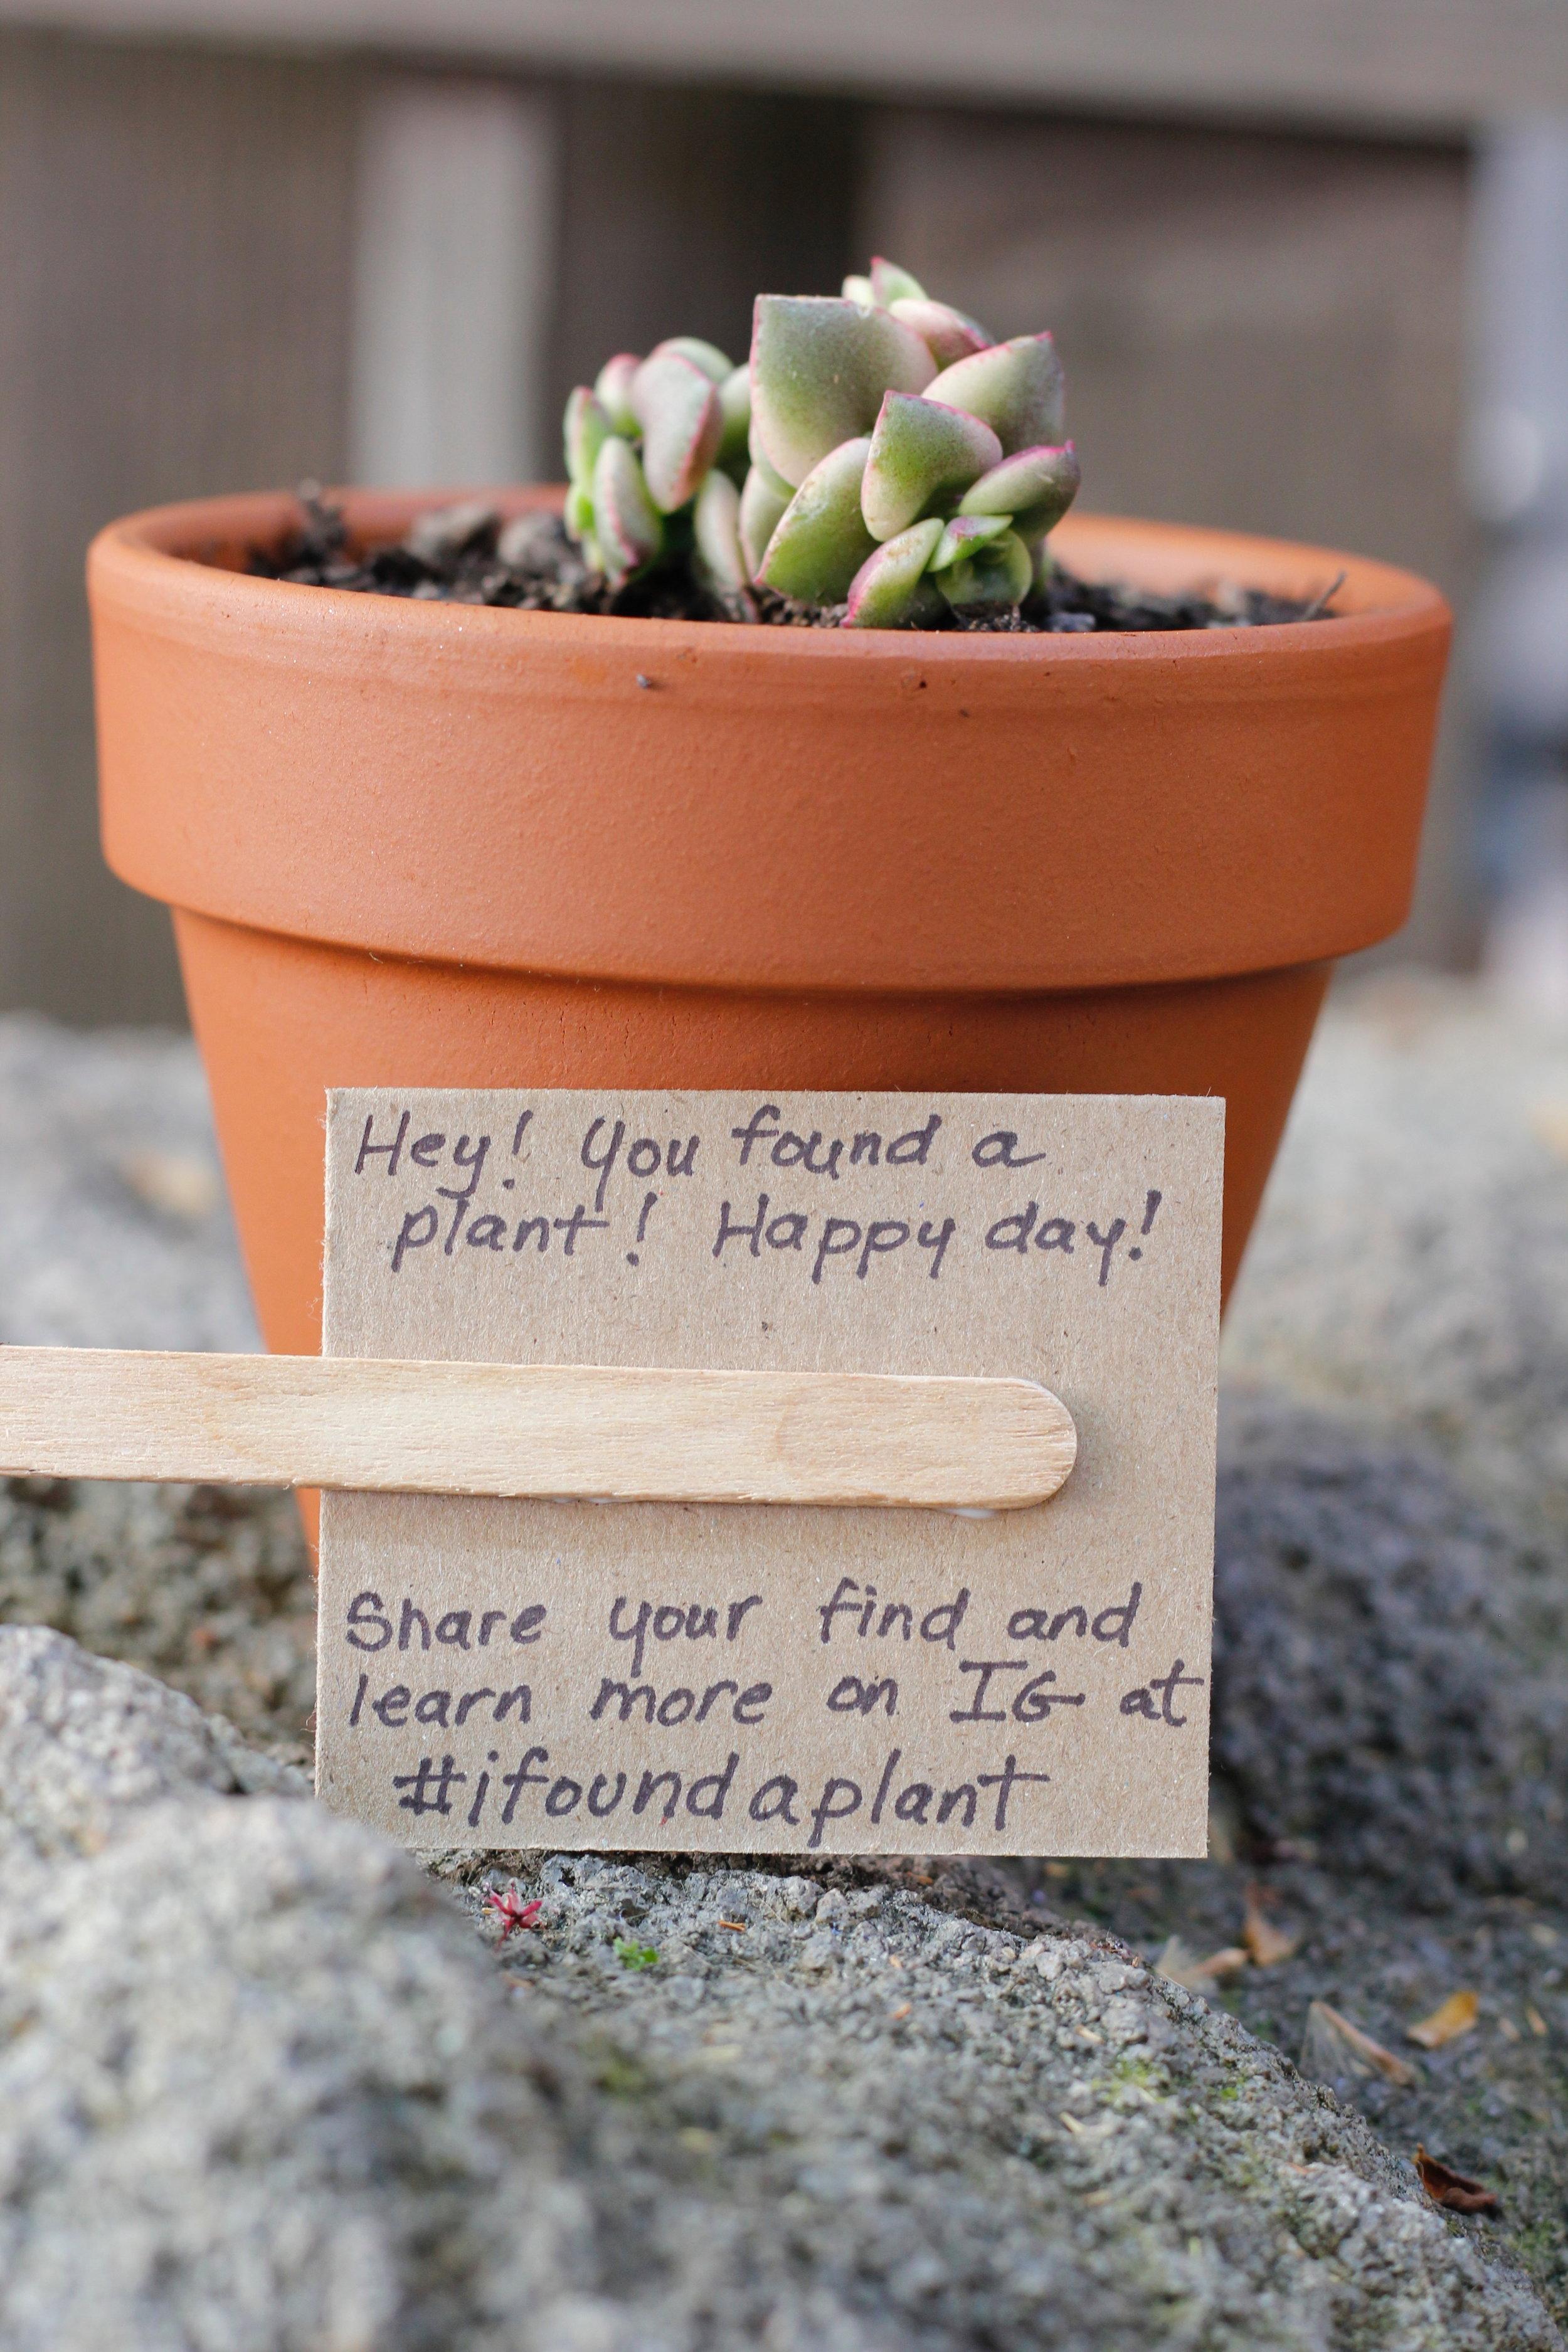 #ifoundaplant project explanation